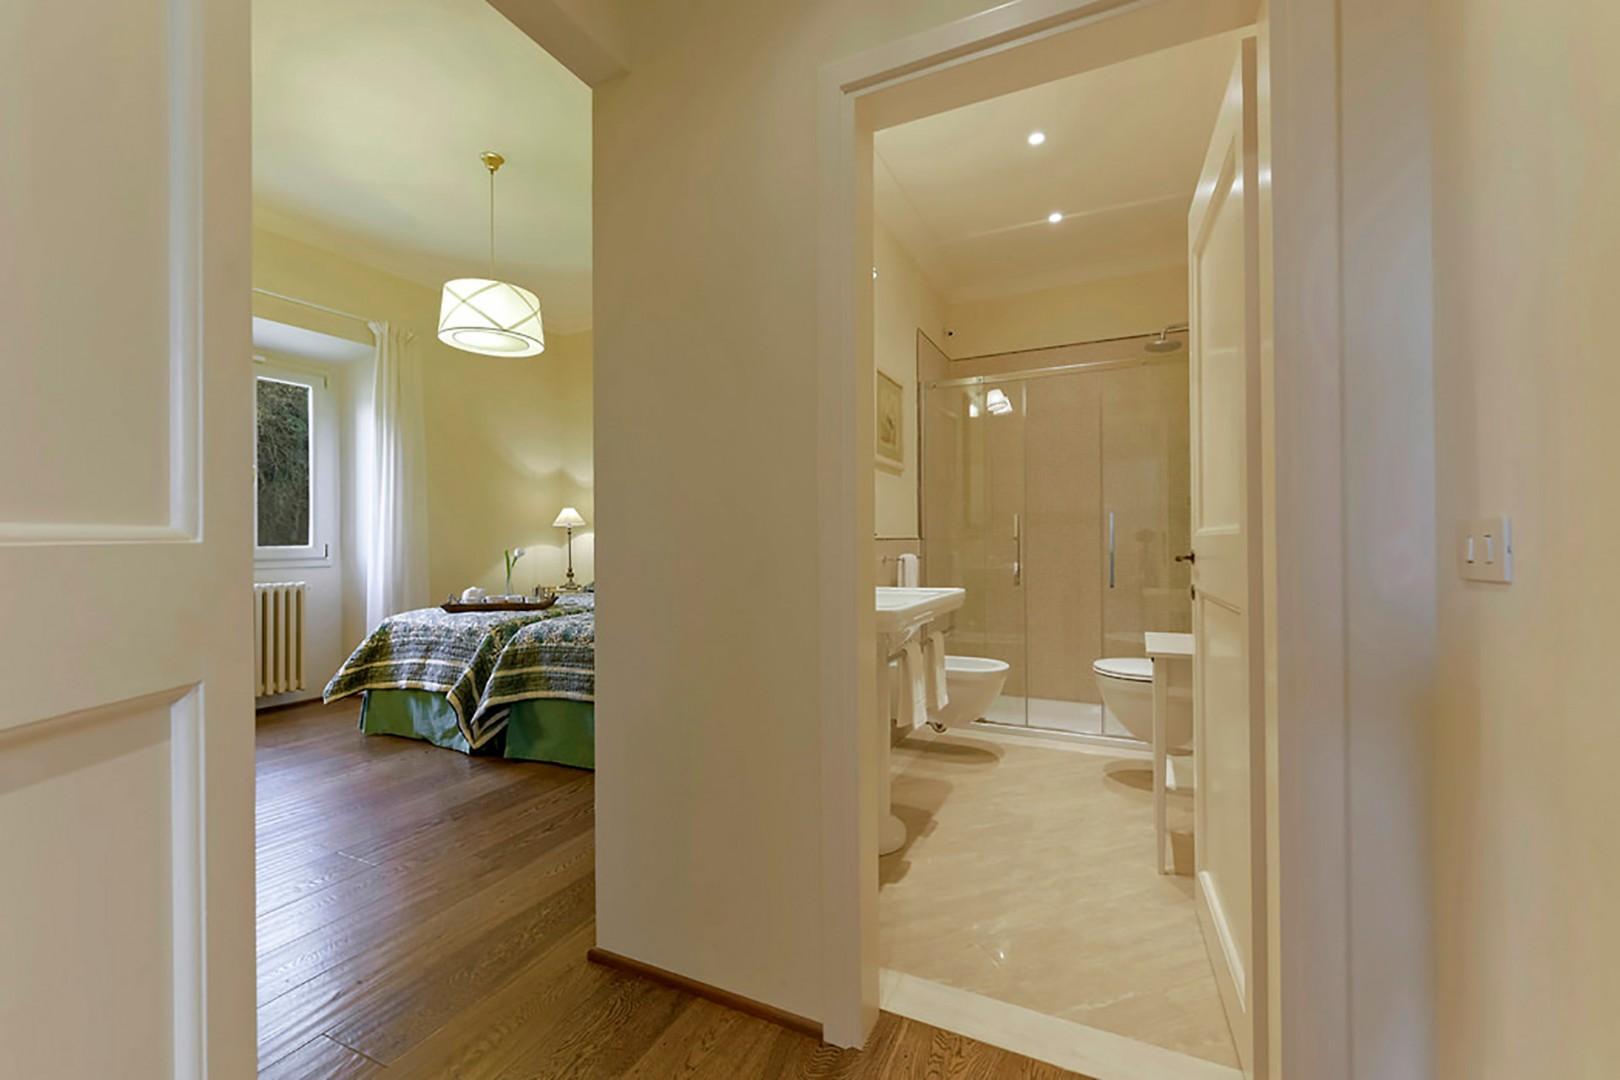 En suite bathroom 4 with a large shower.